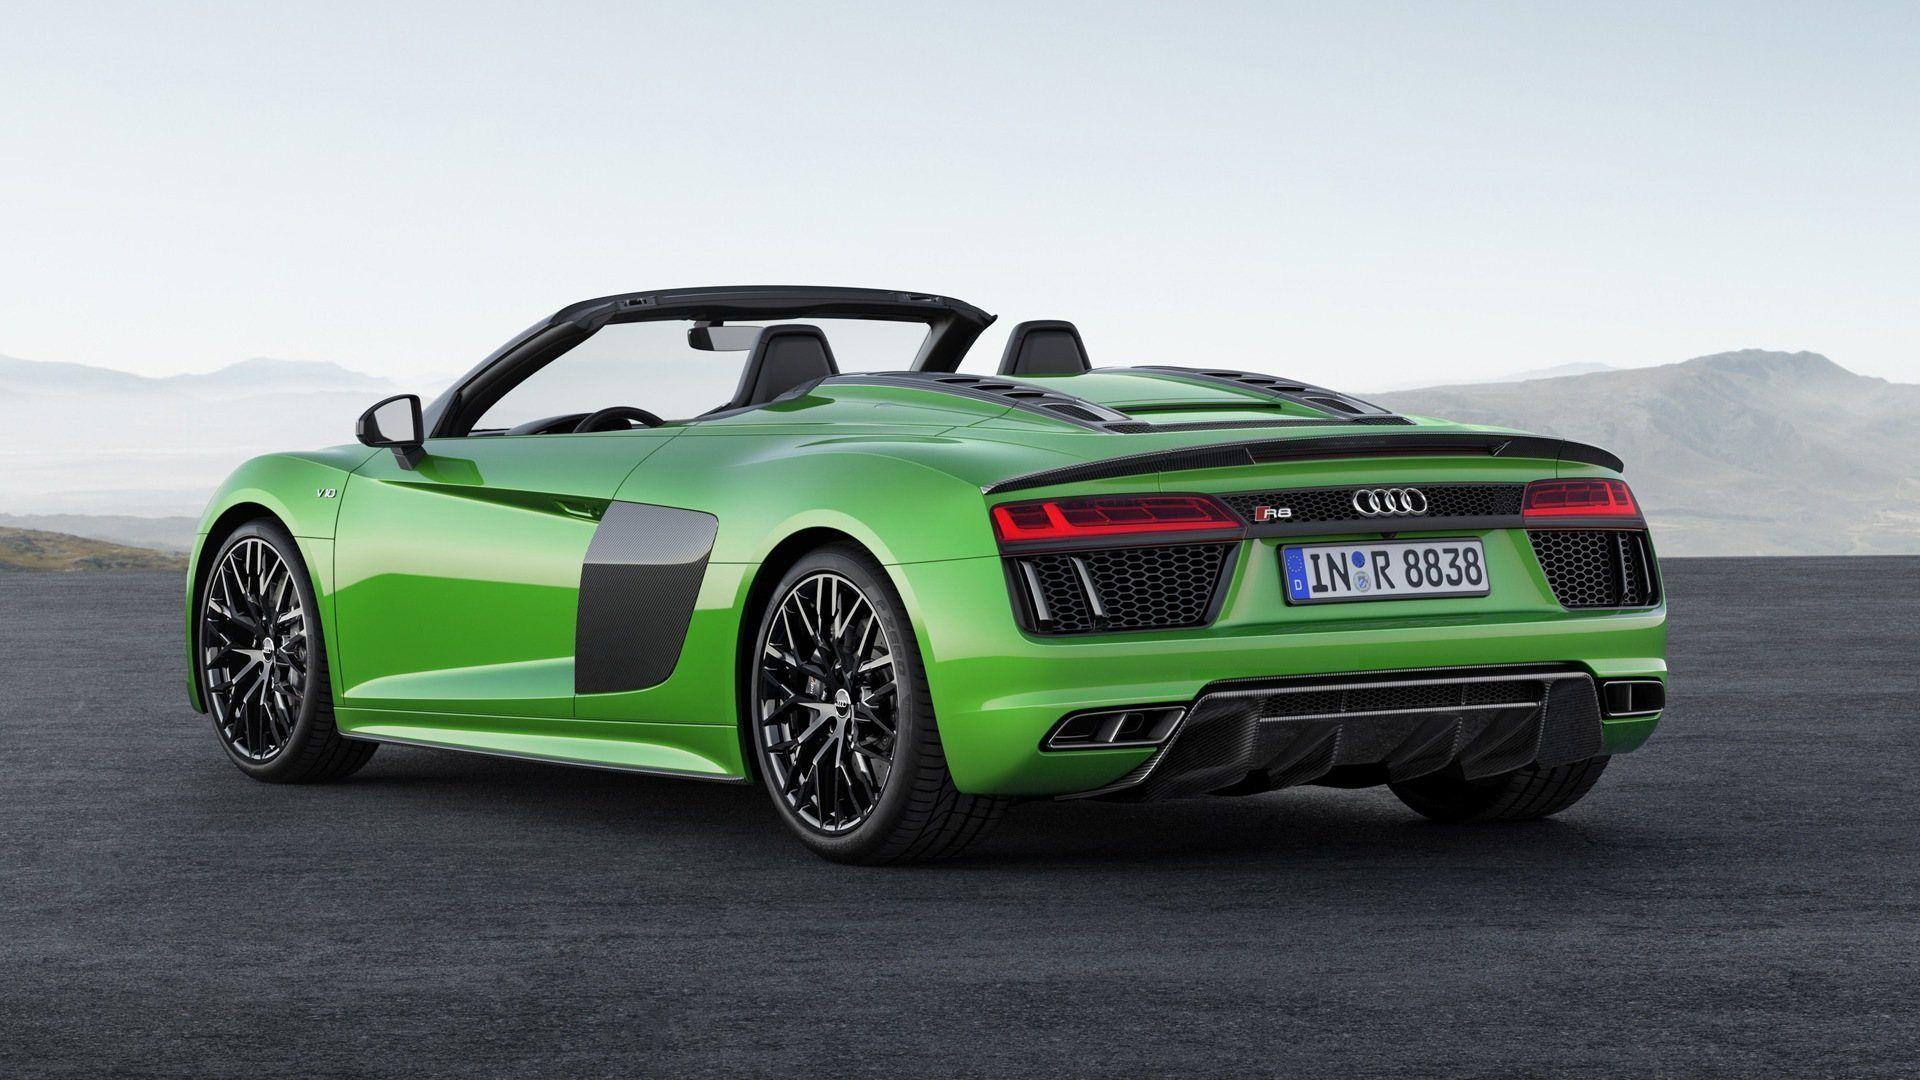 2021 Audi R8 V10 Spyder Review in 2020 | Audi r8 spyder ...